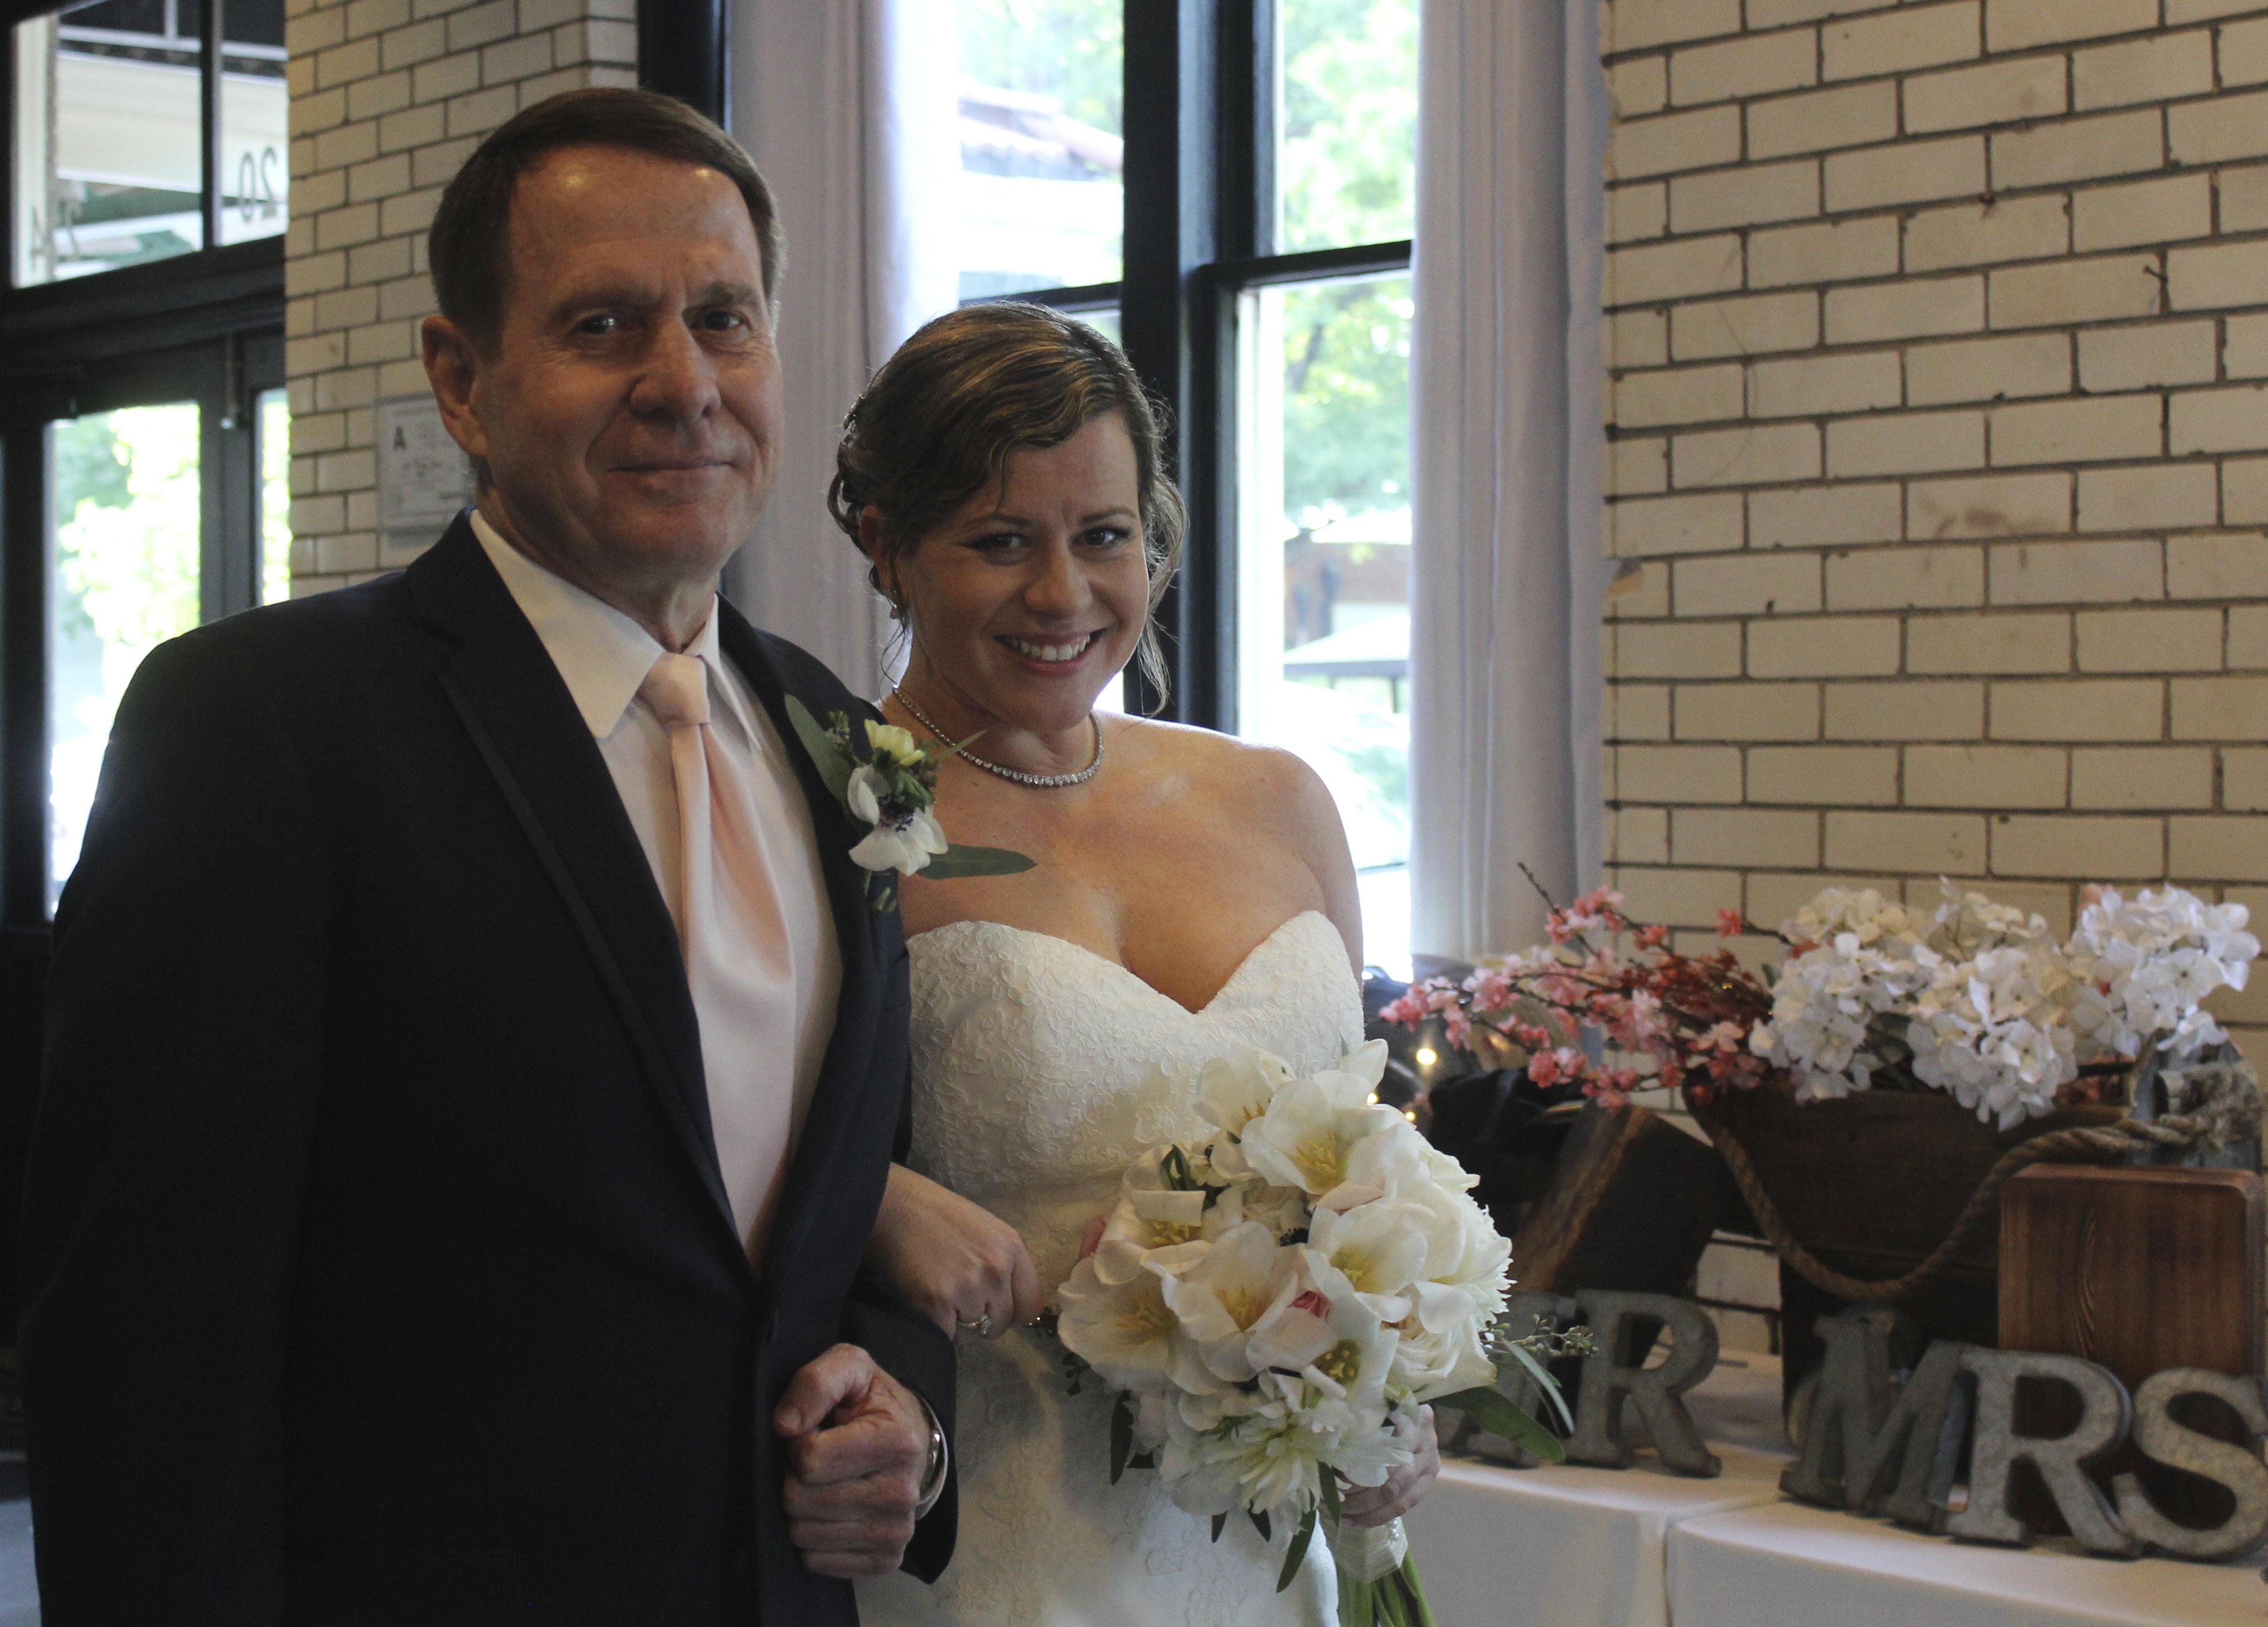 J&S - Magnolia Grove Weddings and Events